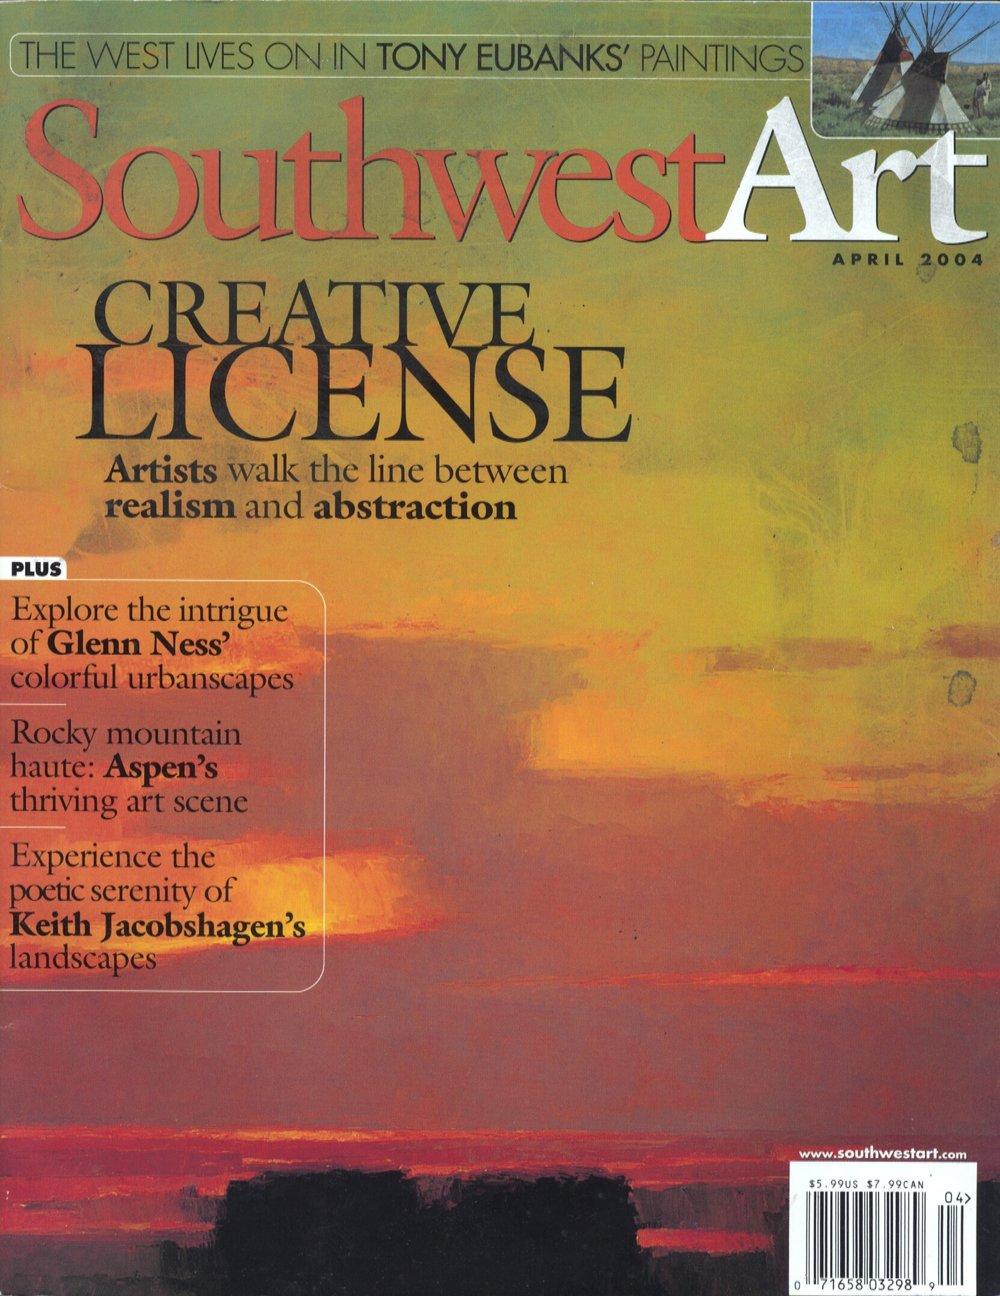 Scan-Mccaw Mag 26 copy 3.jpg